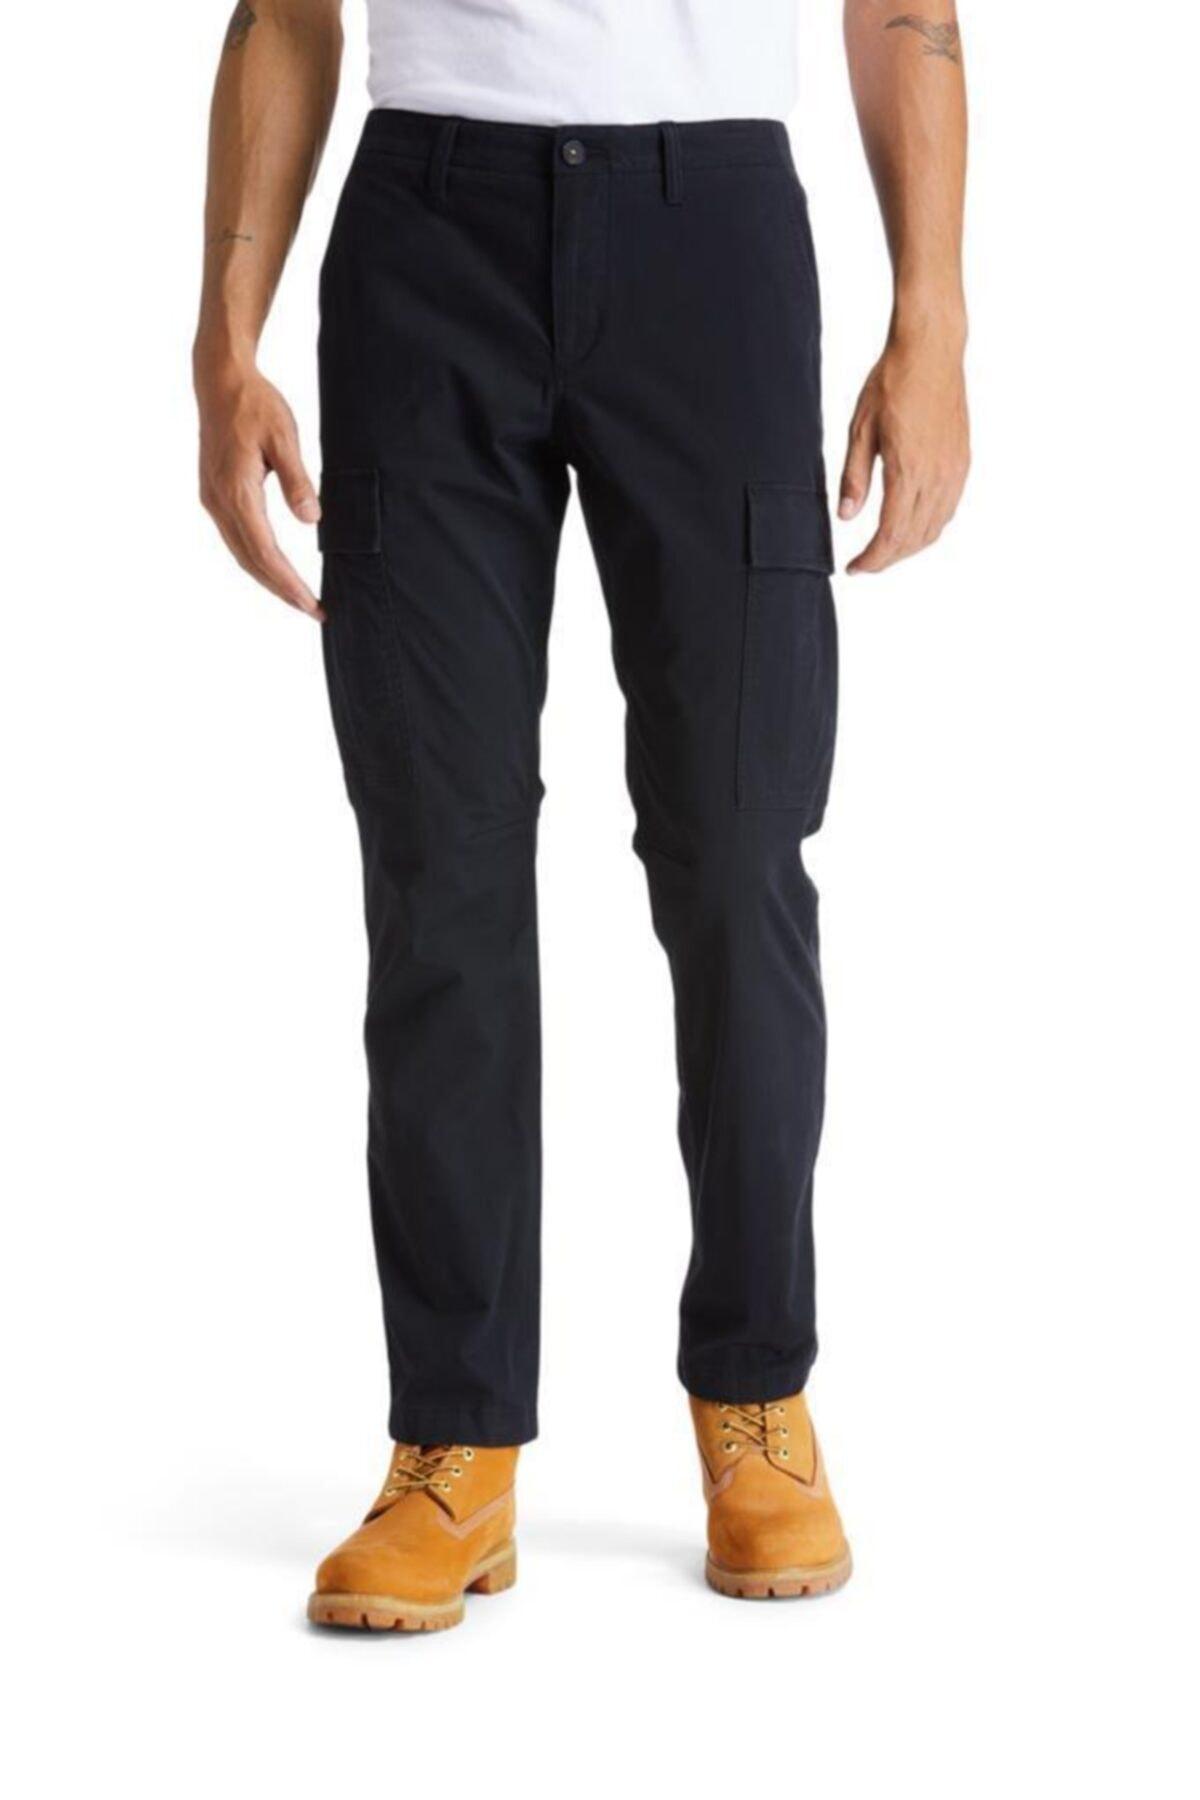 Timberland Core Twill Cargo Erkek Pantolon Siyah 1